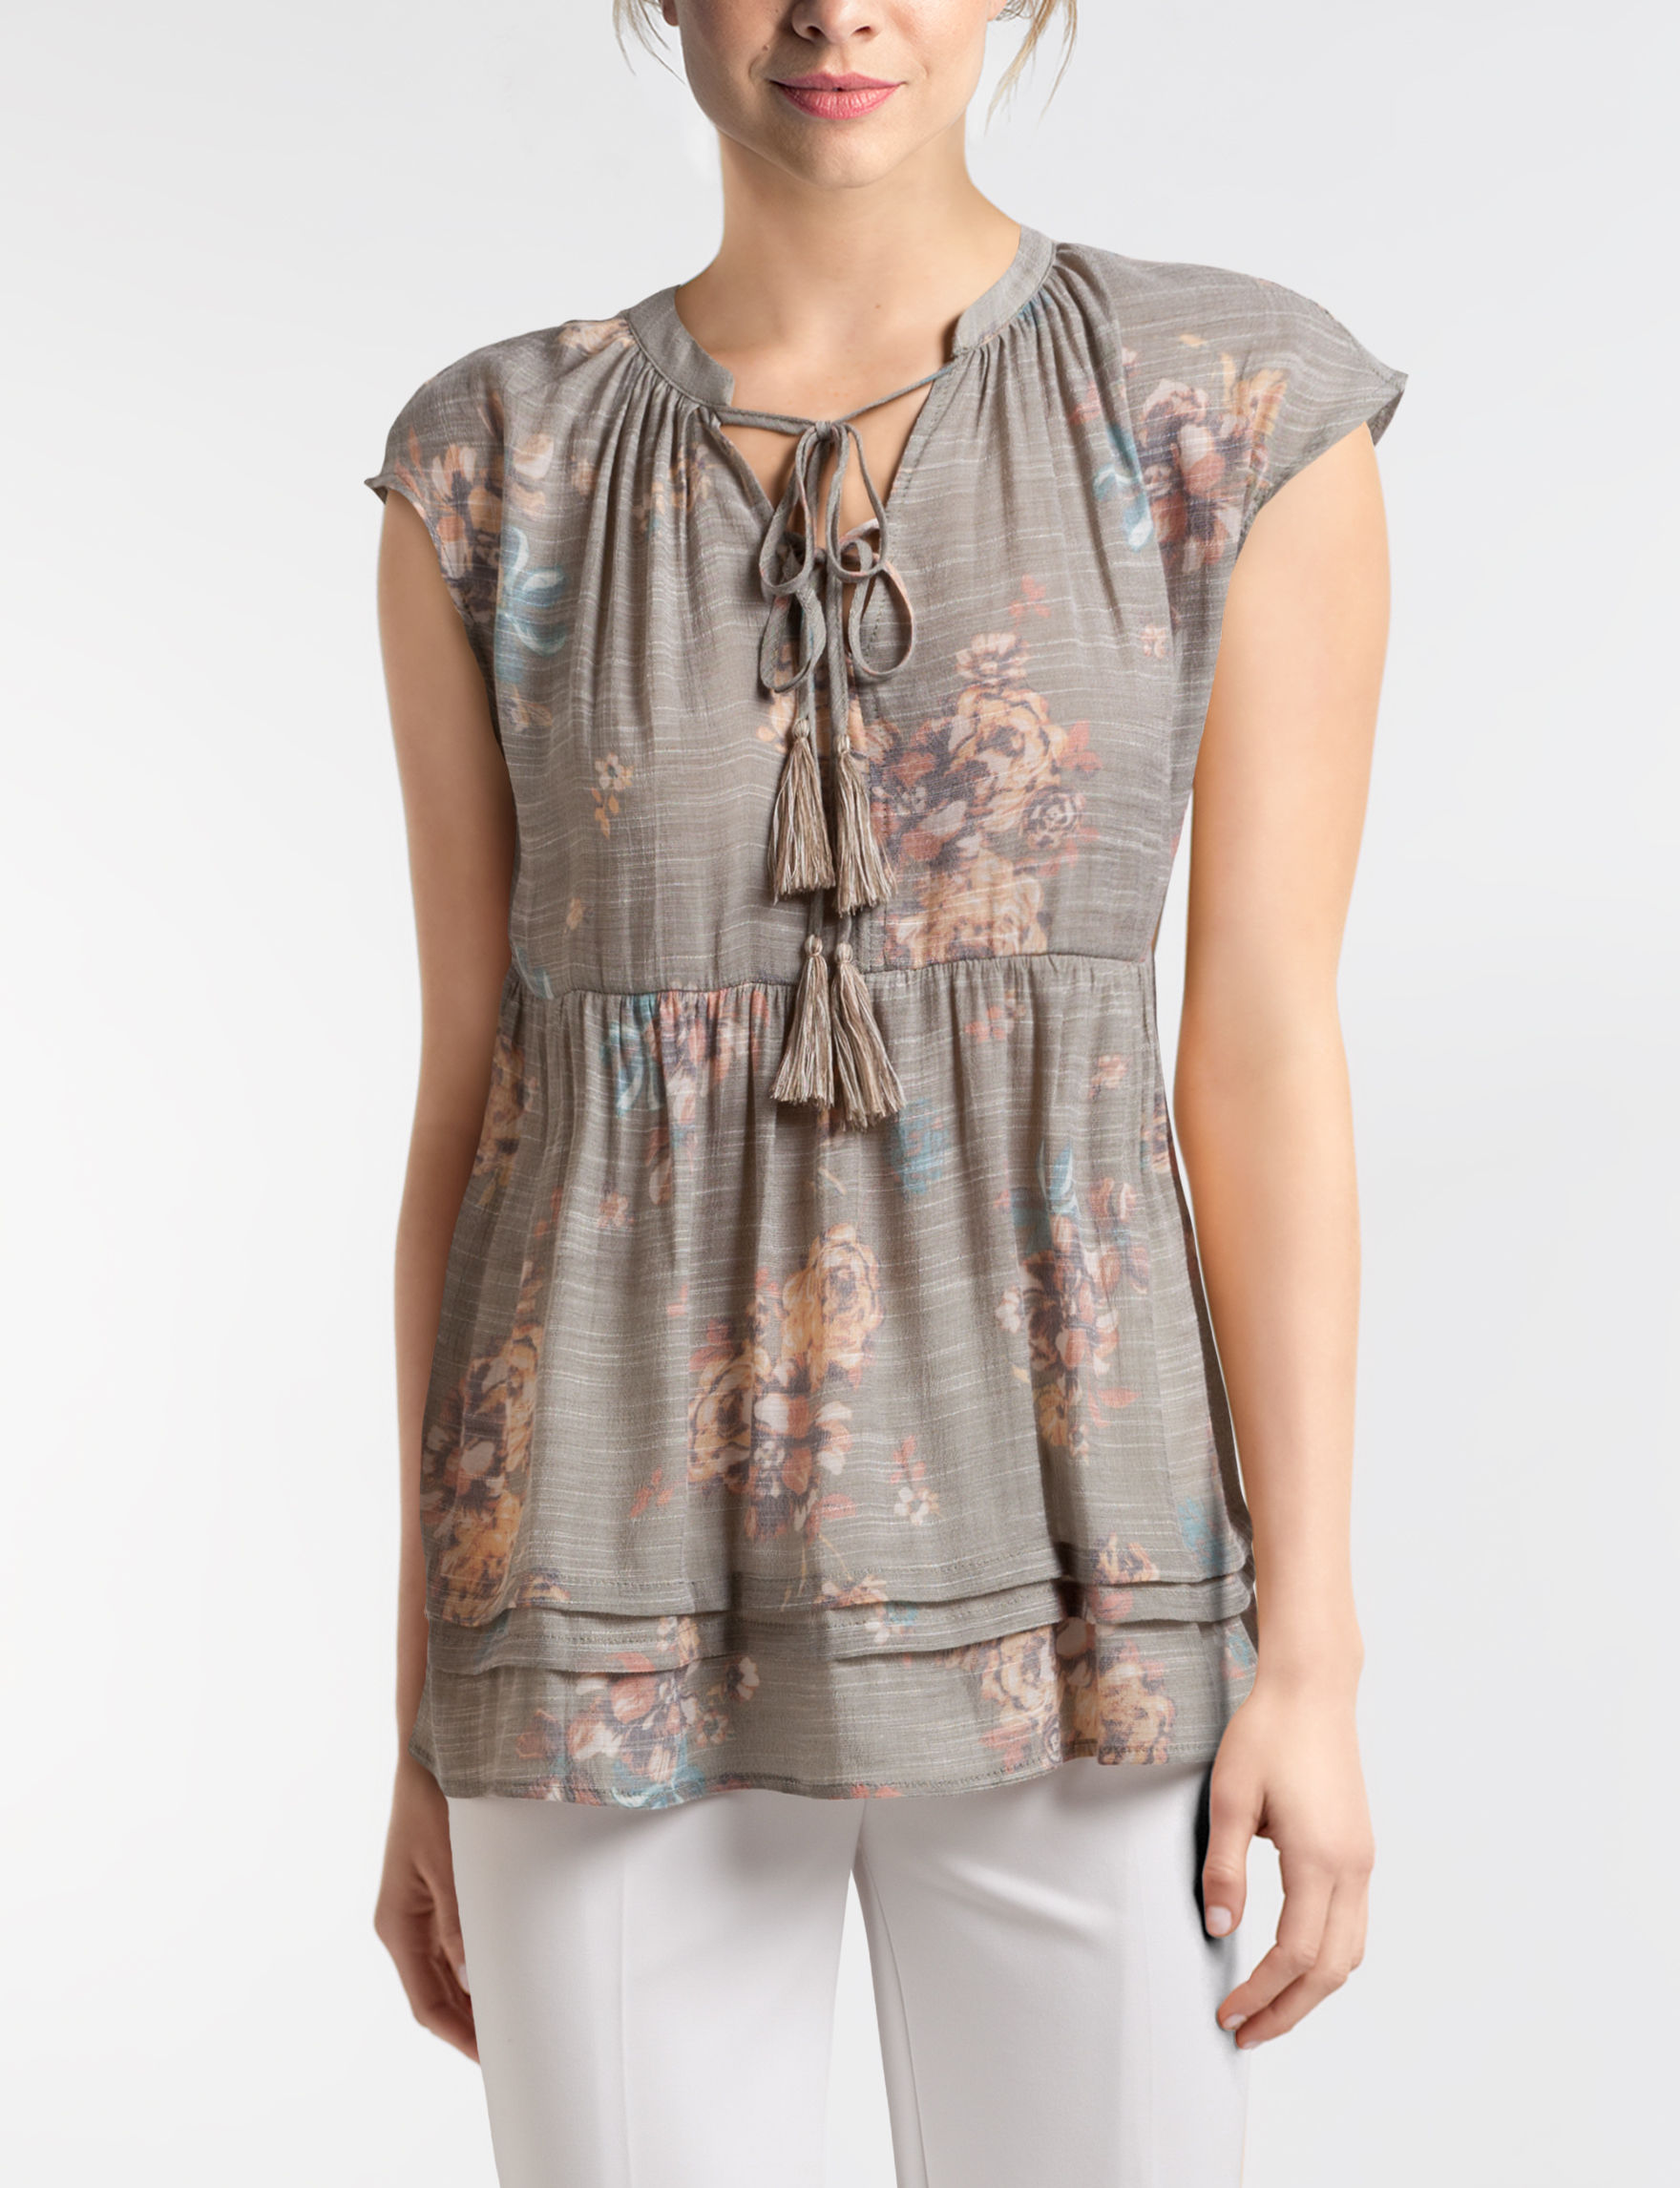 Hannah Green Multi Shirts & Blouses